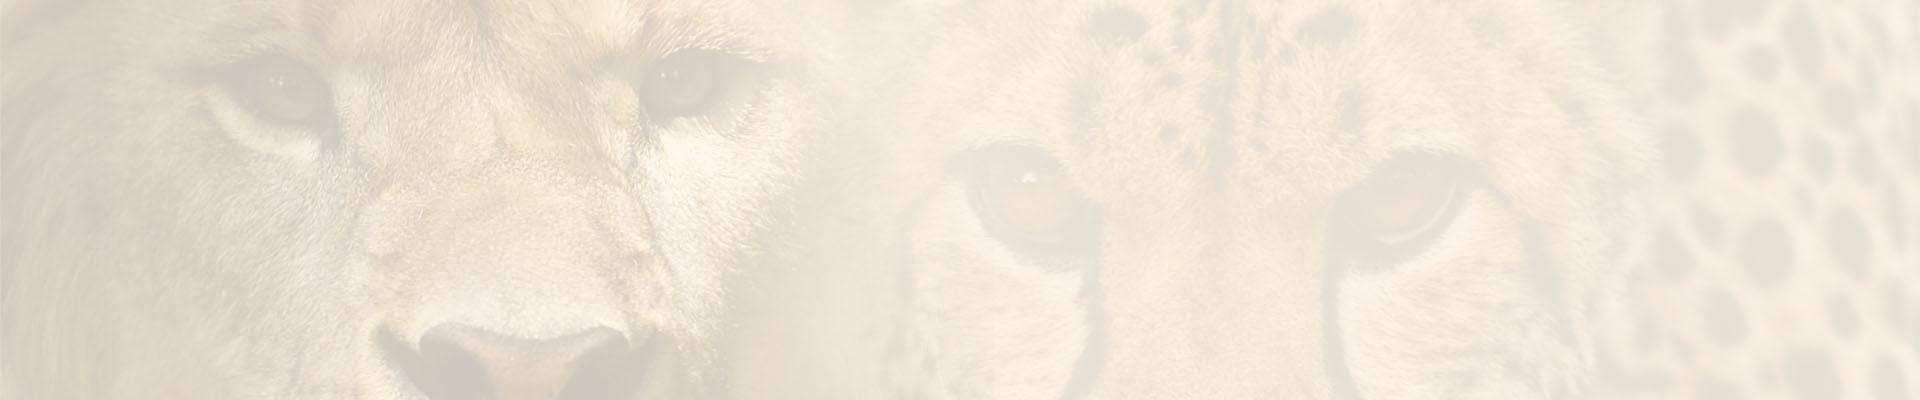 fondo Reino Animal